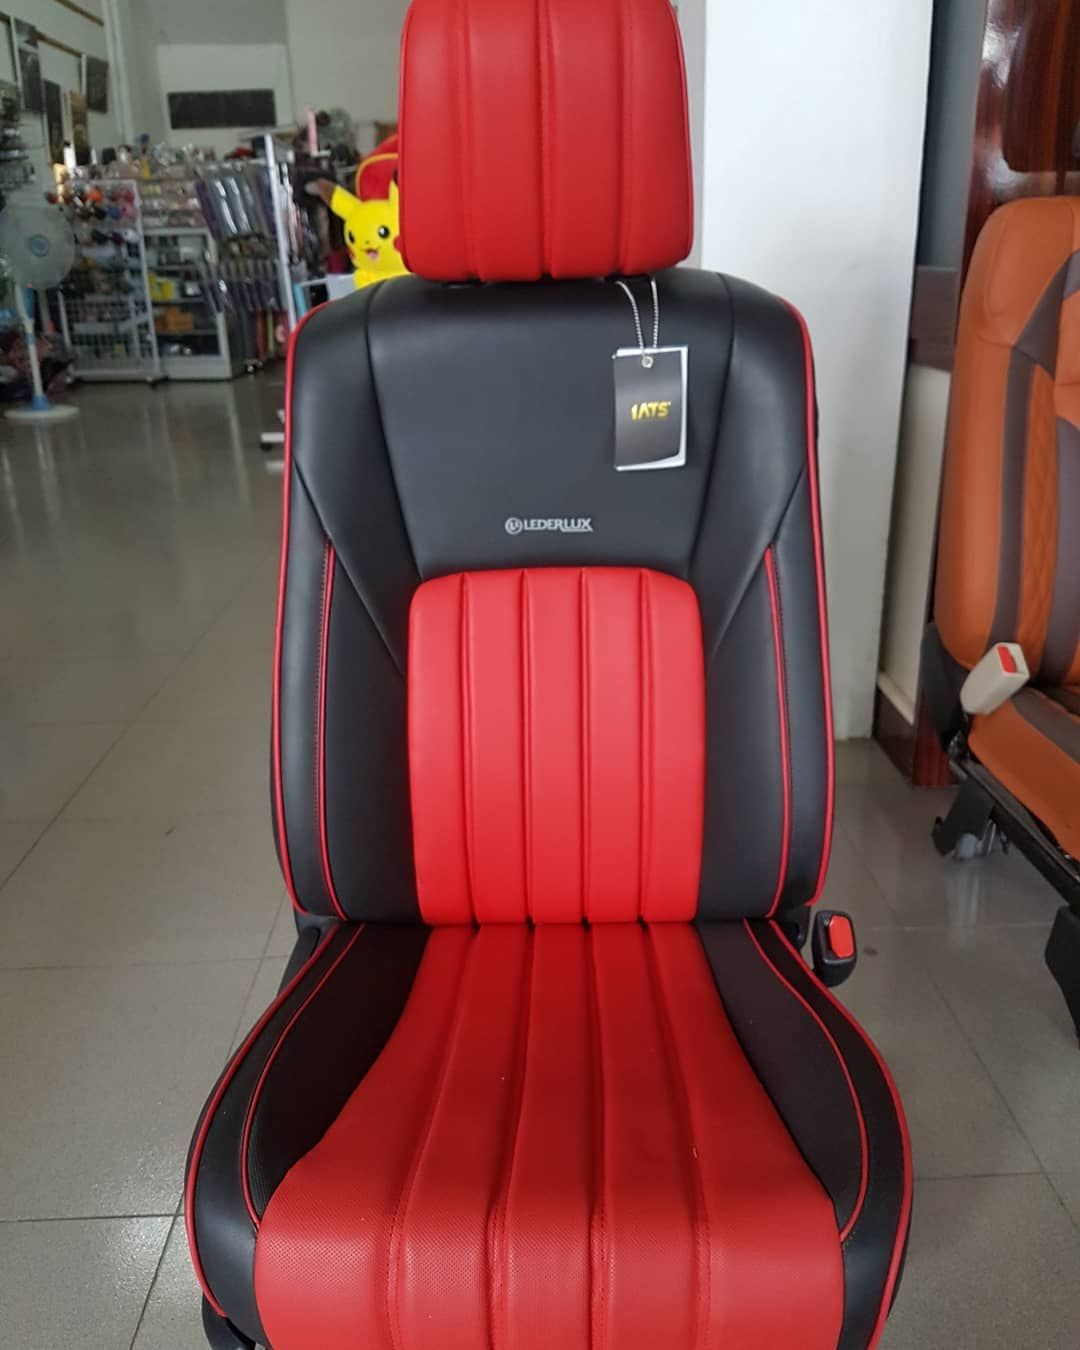 Pin en Automotive upholstery